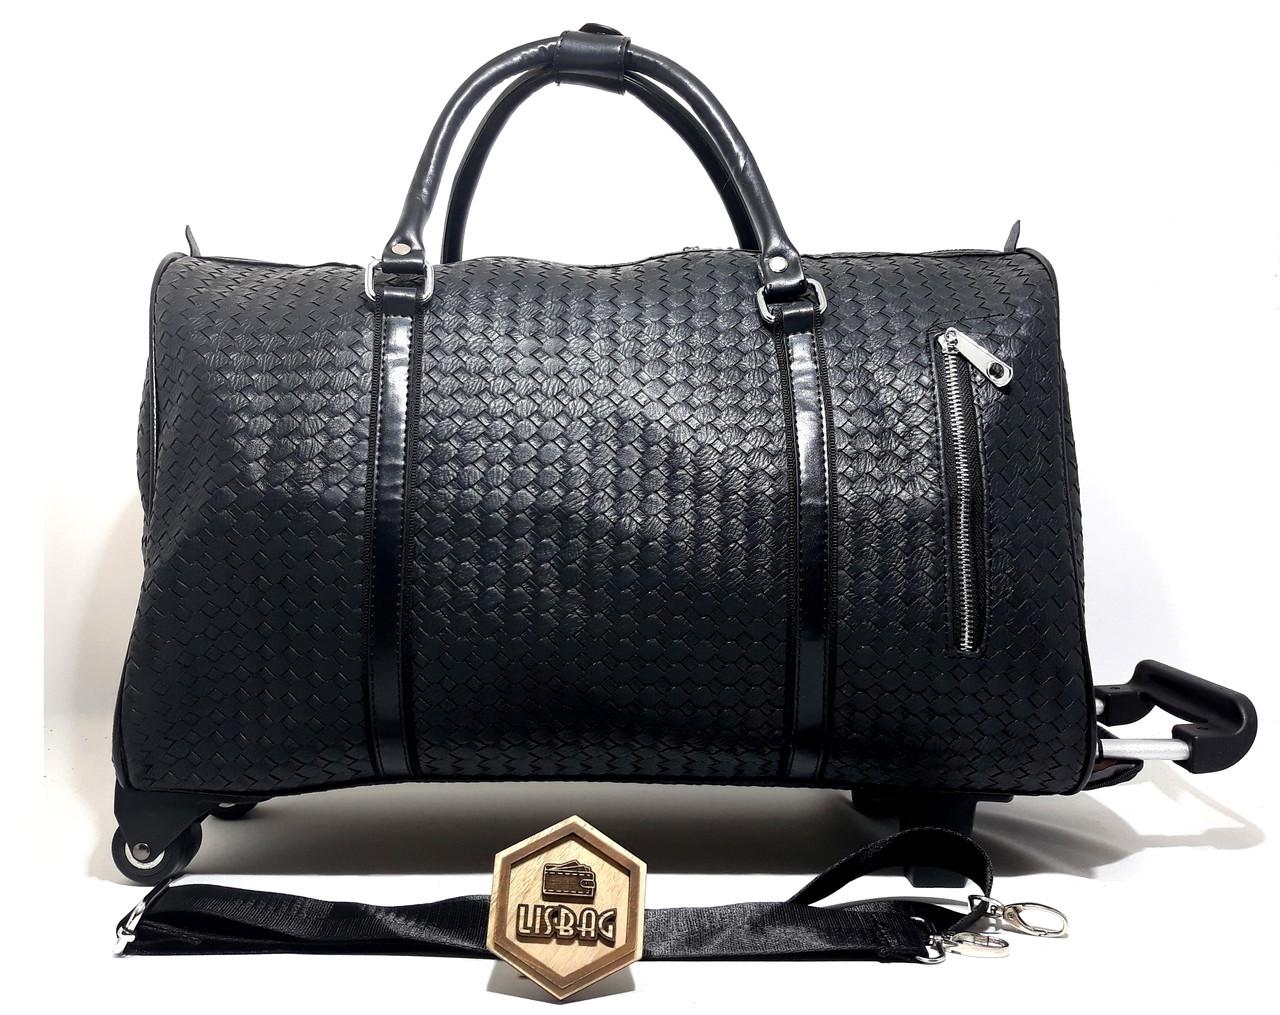 1afd96dbc70d ... Сумка на колесах Средняя Черная (50*20*34) чемодан дорожная сумка  валіза ...